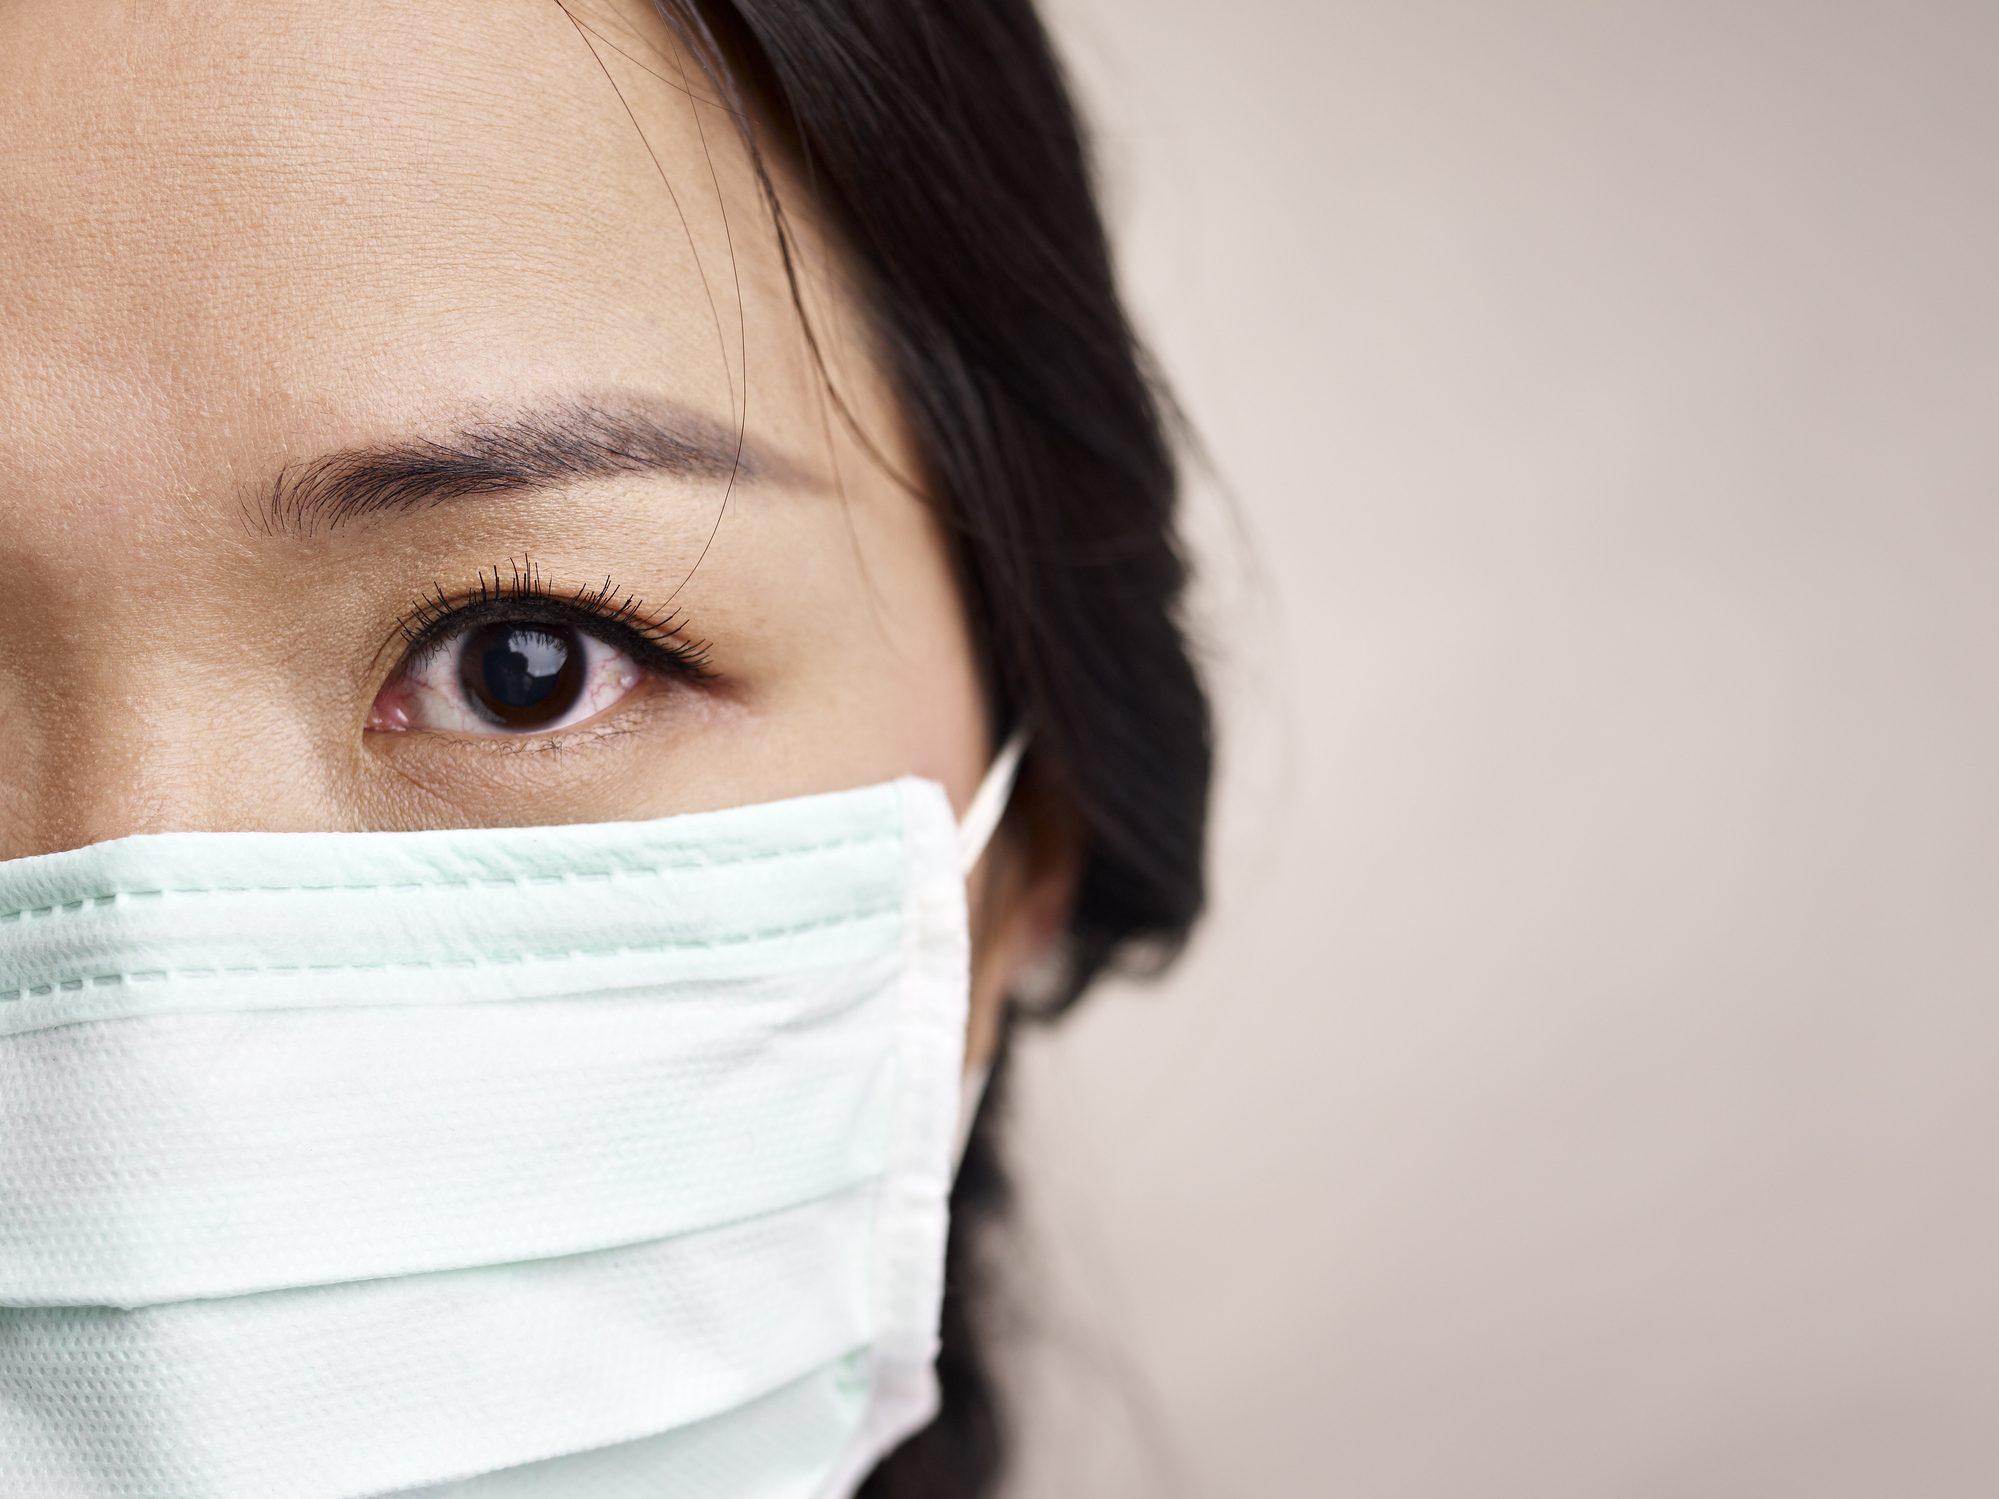 maschera antivirus di stoffa